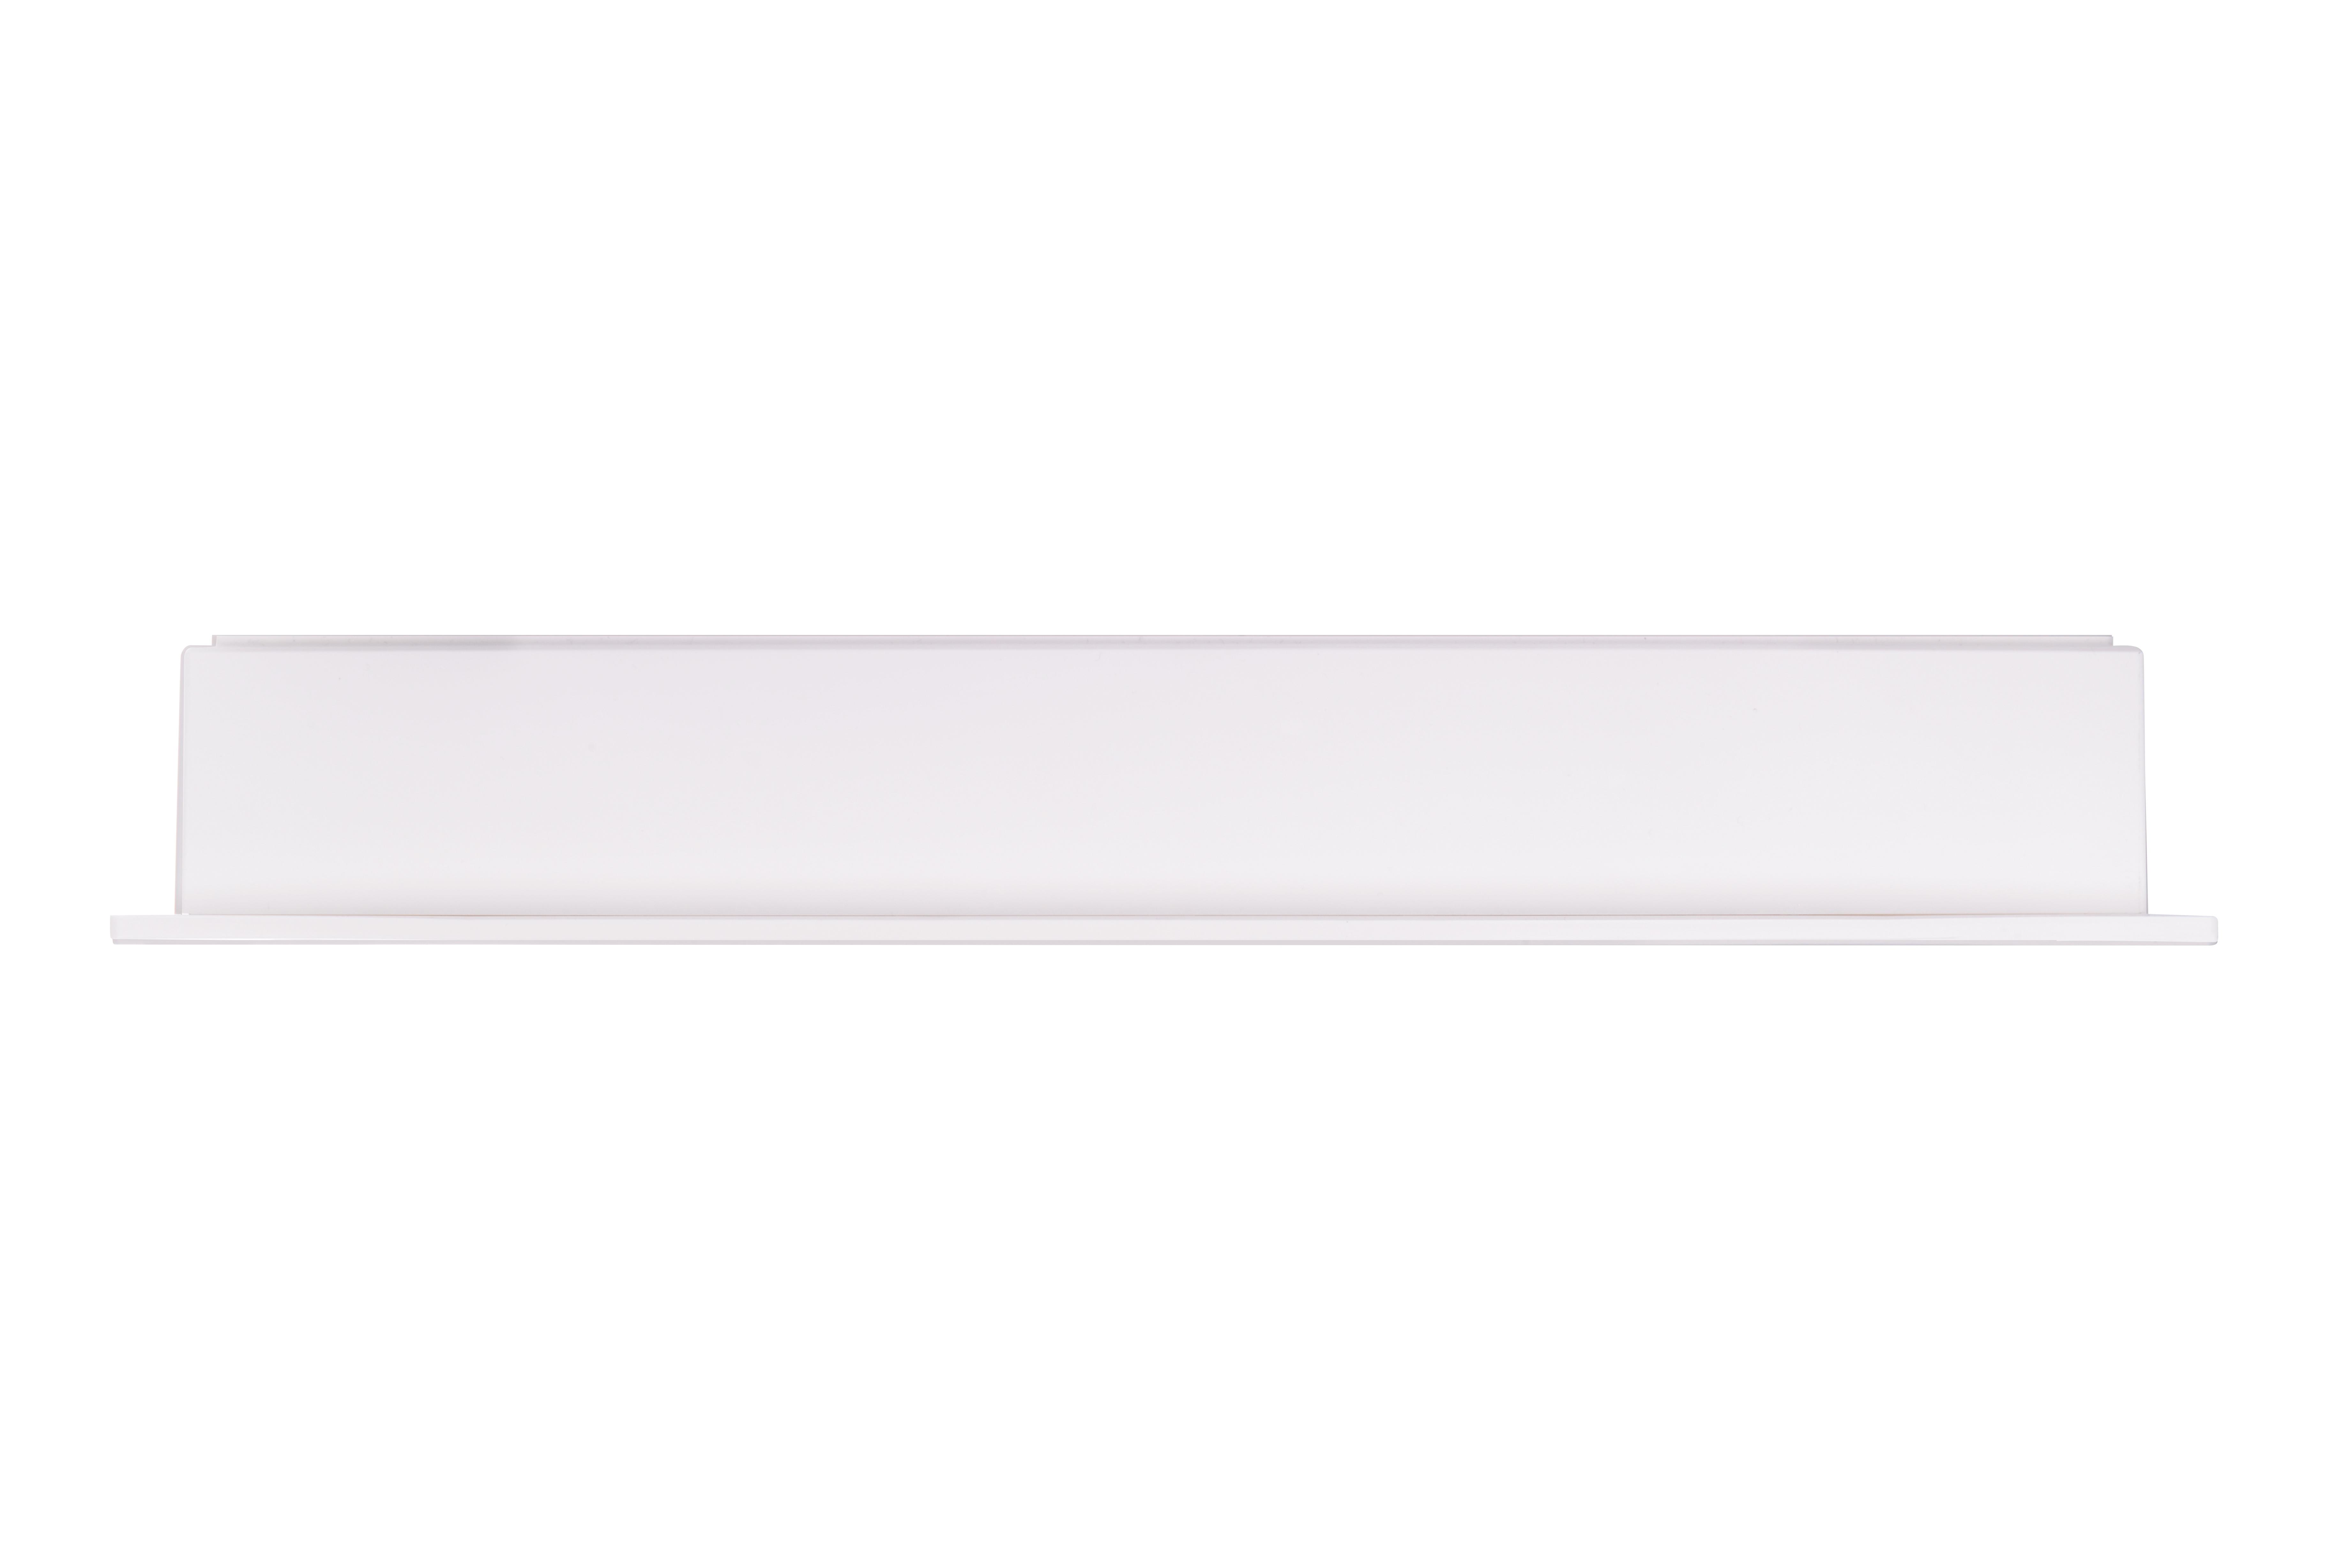 Lampa antipanica led Intelight 94756   3h mentinut test automat 5